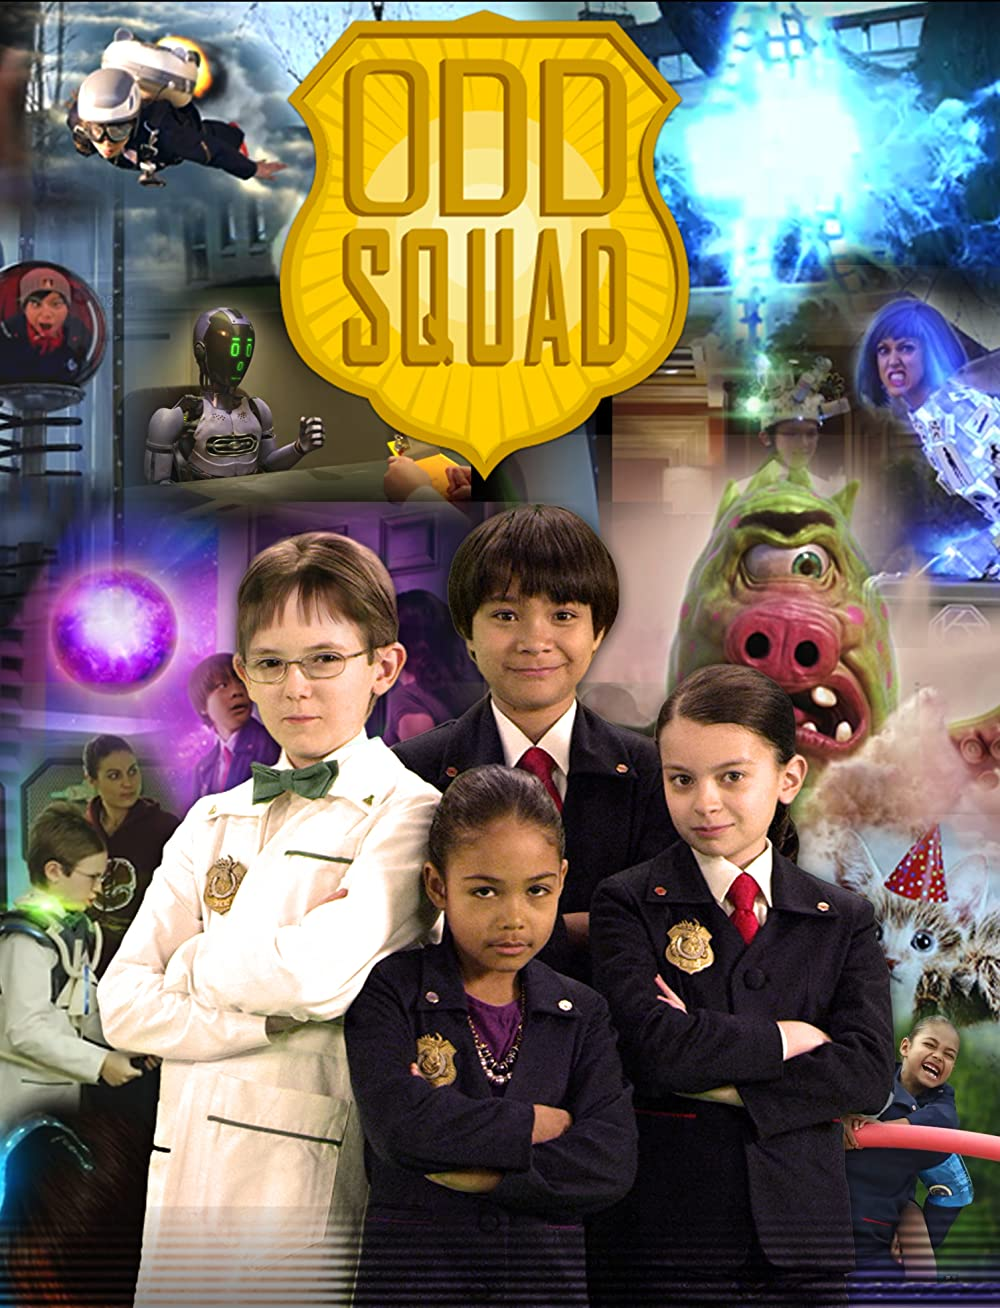 Odd Squad poster